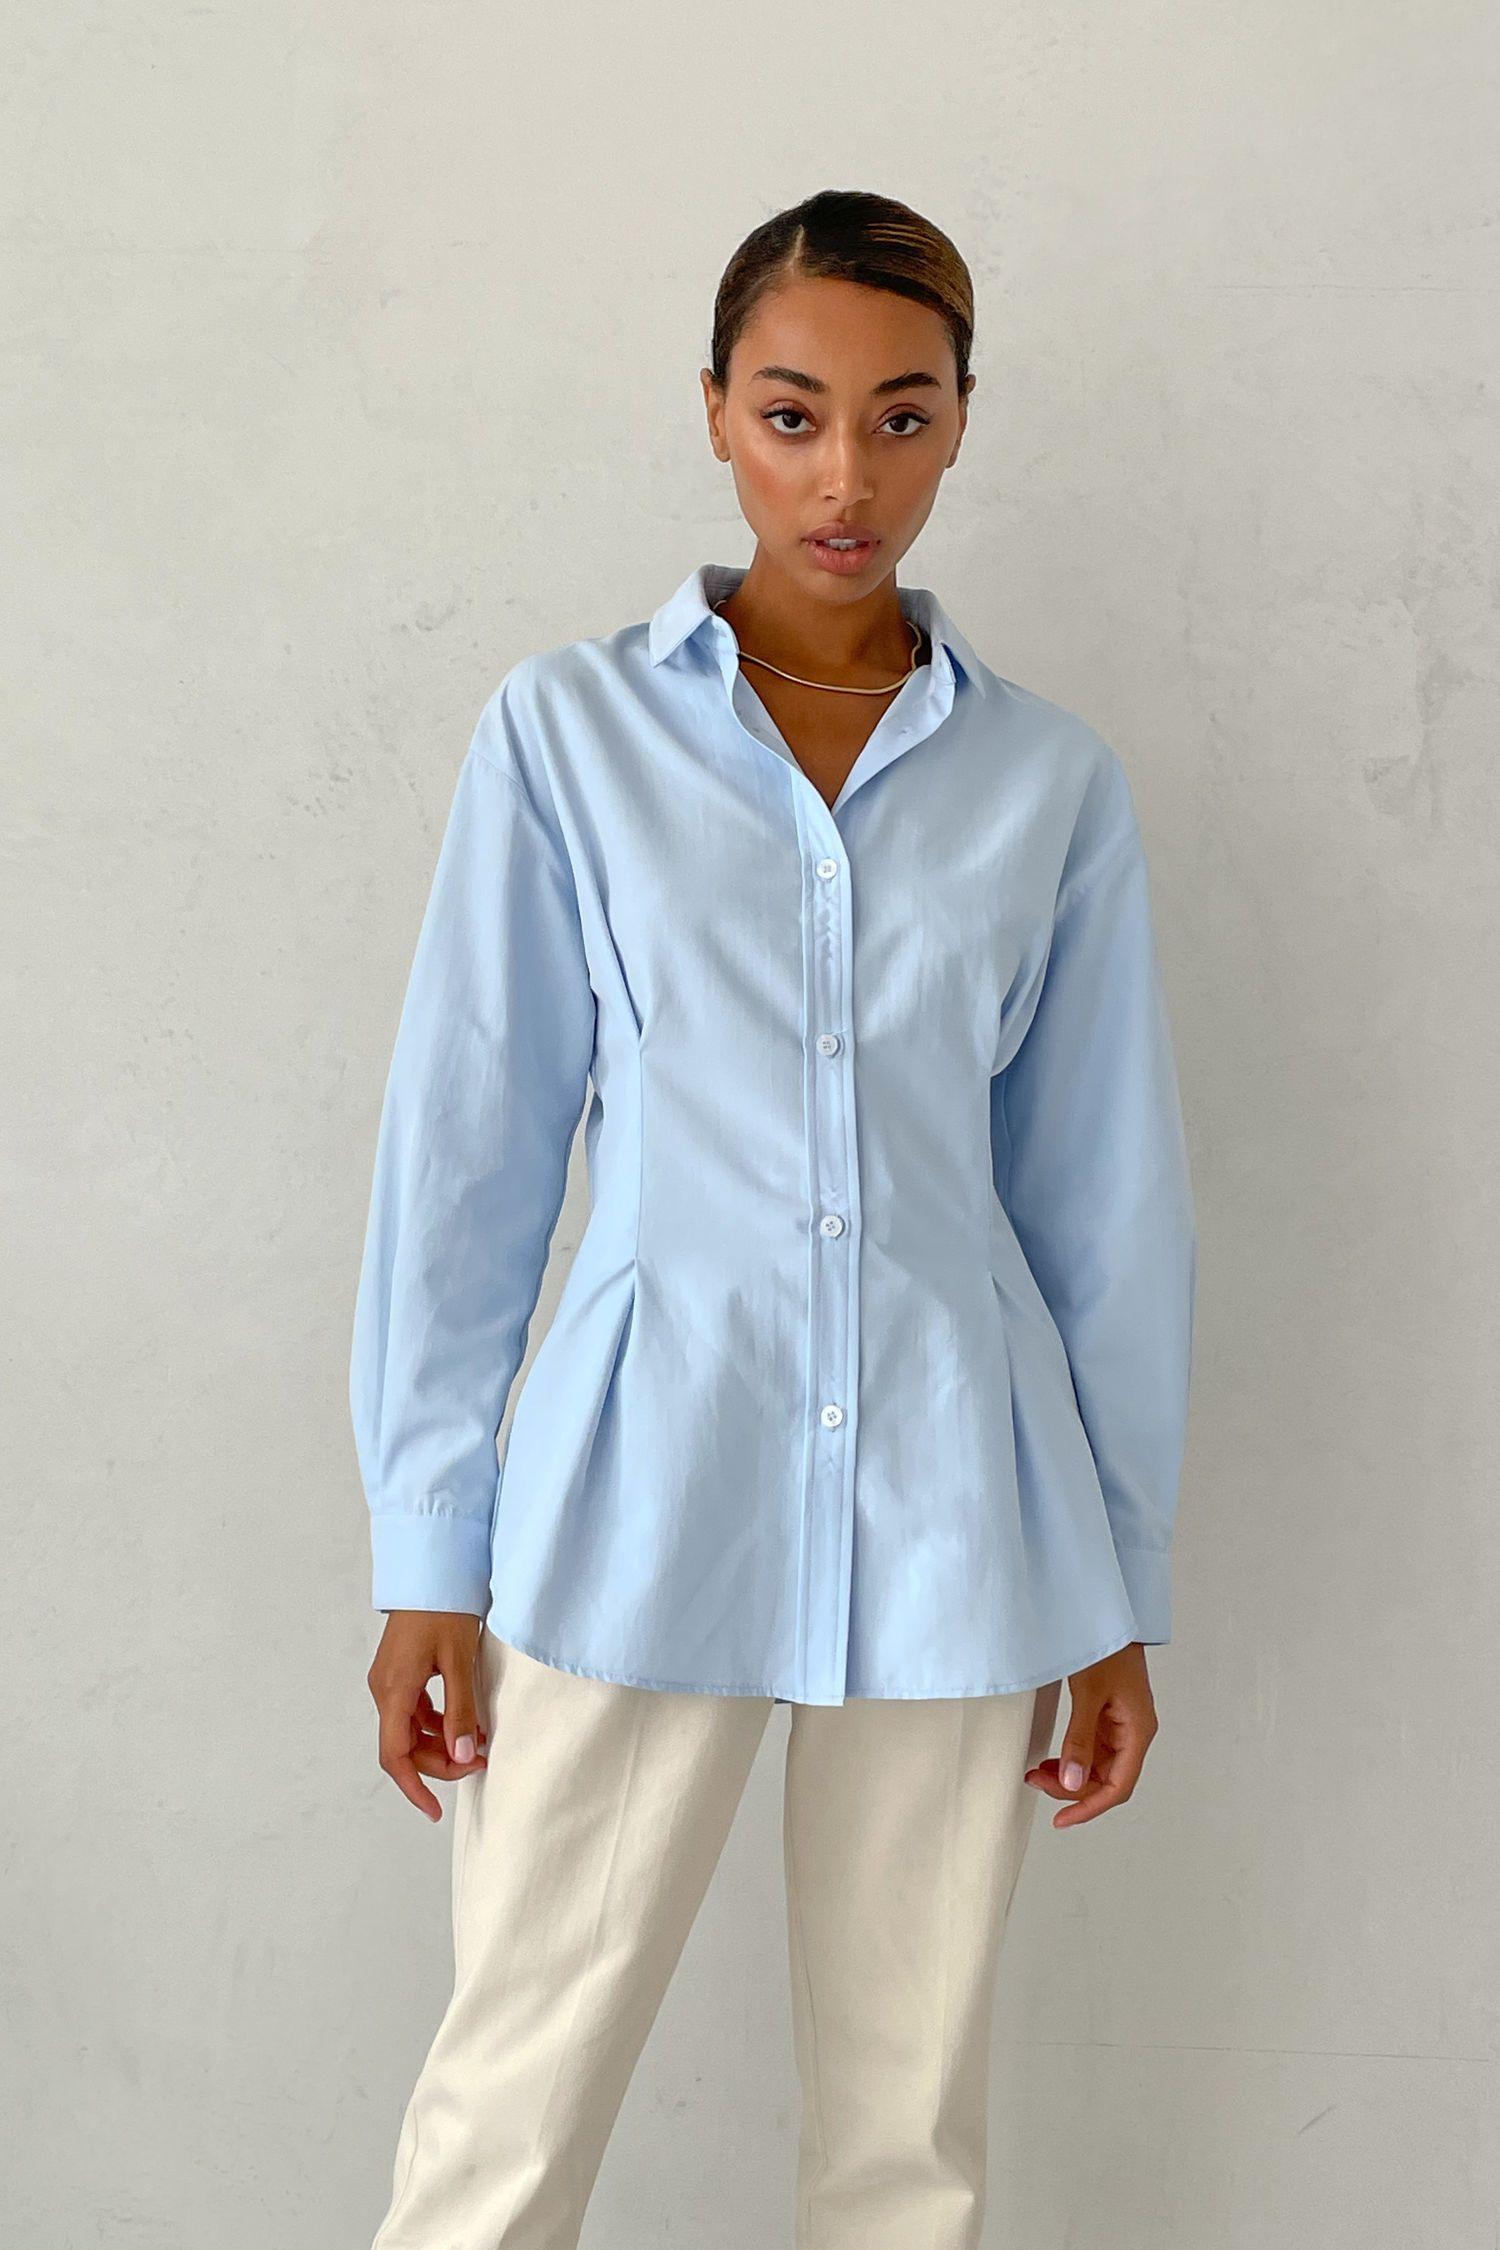 Рубашка с защипами голубая - THE LACE